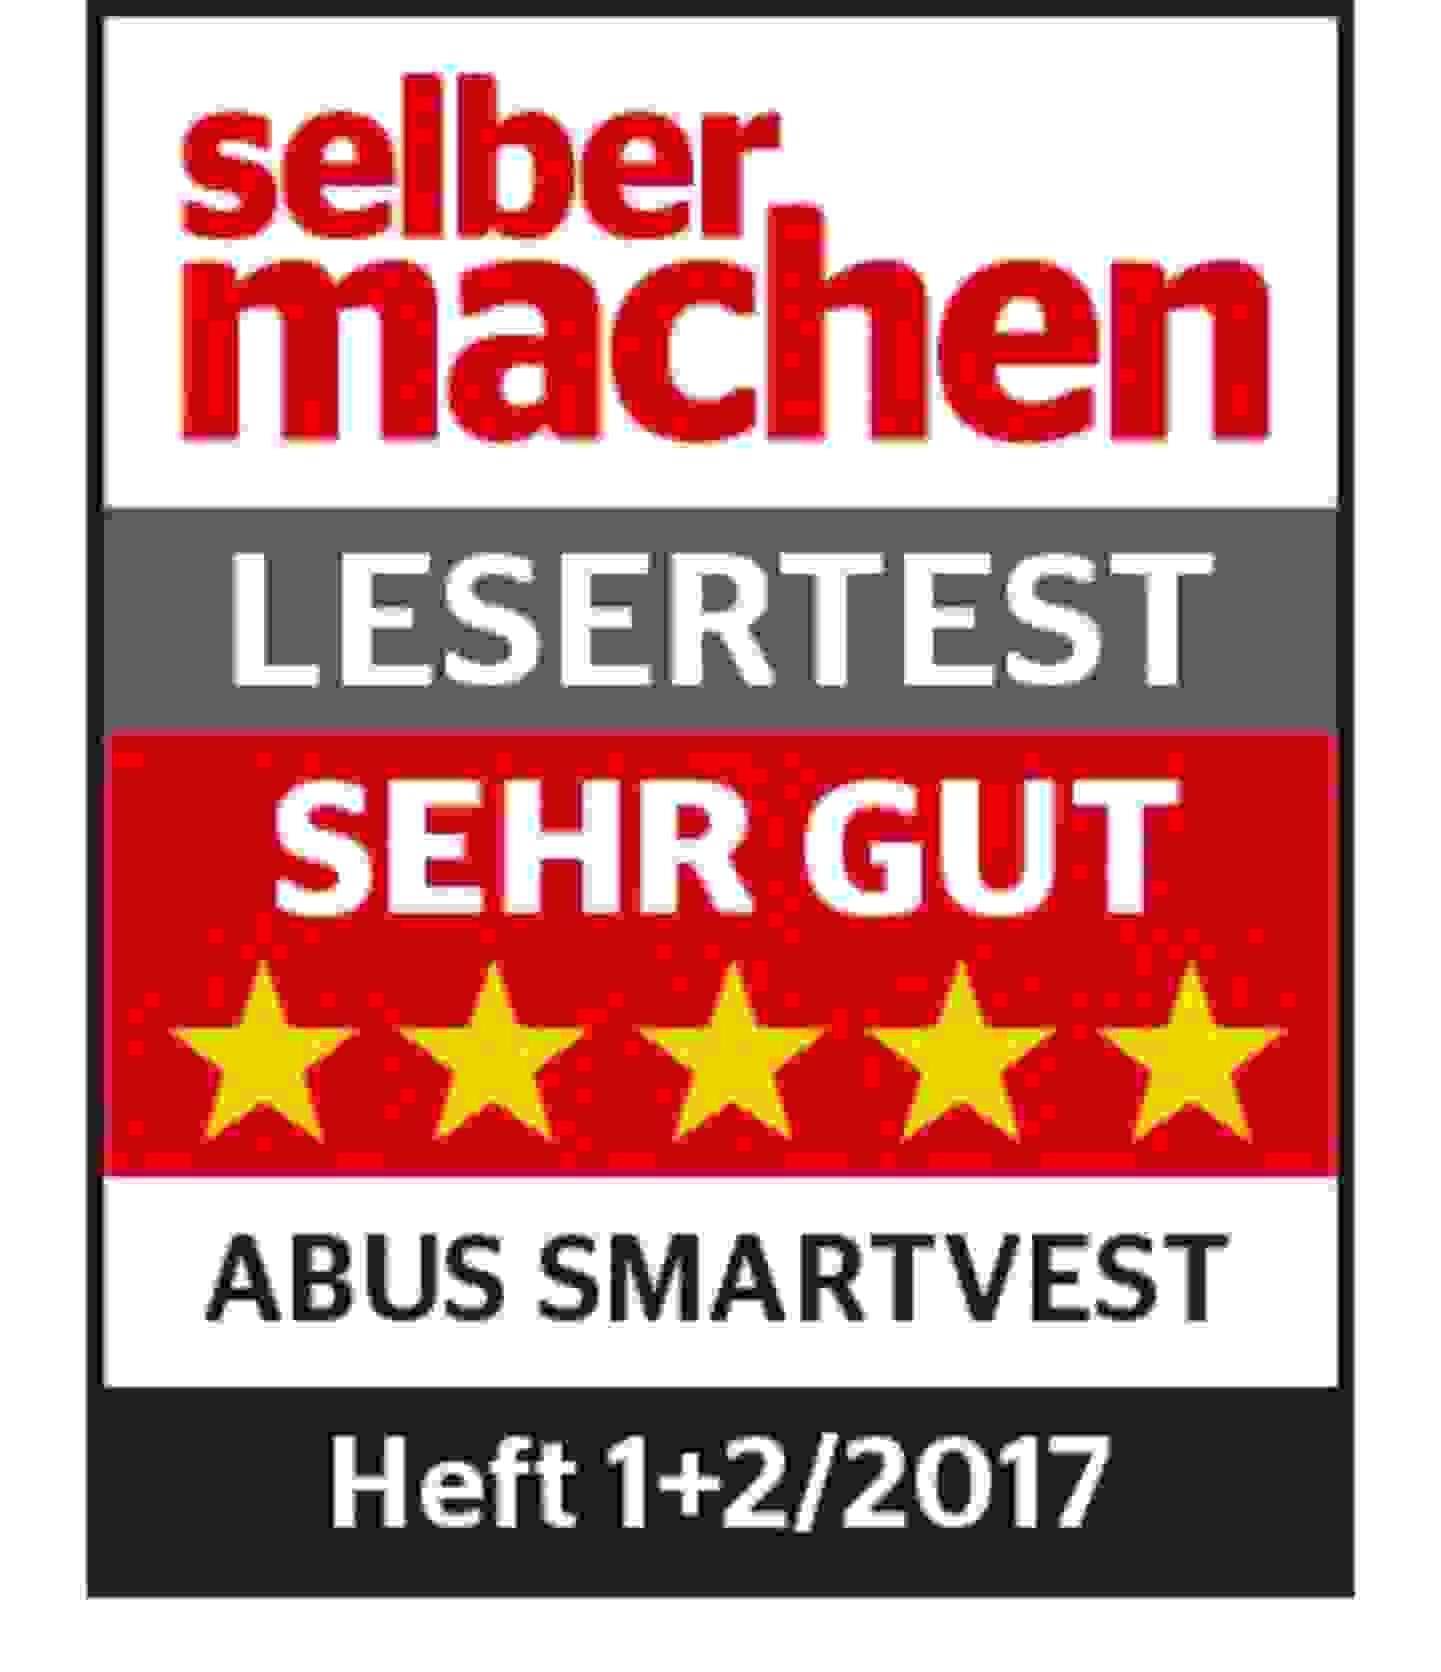 Smartvest‐Praxistest